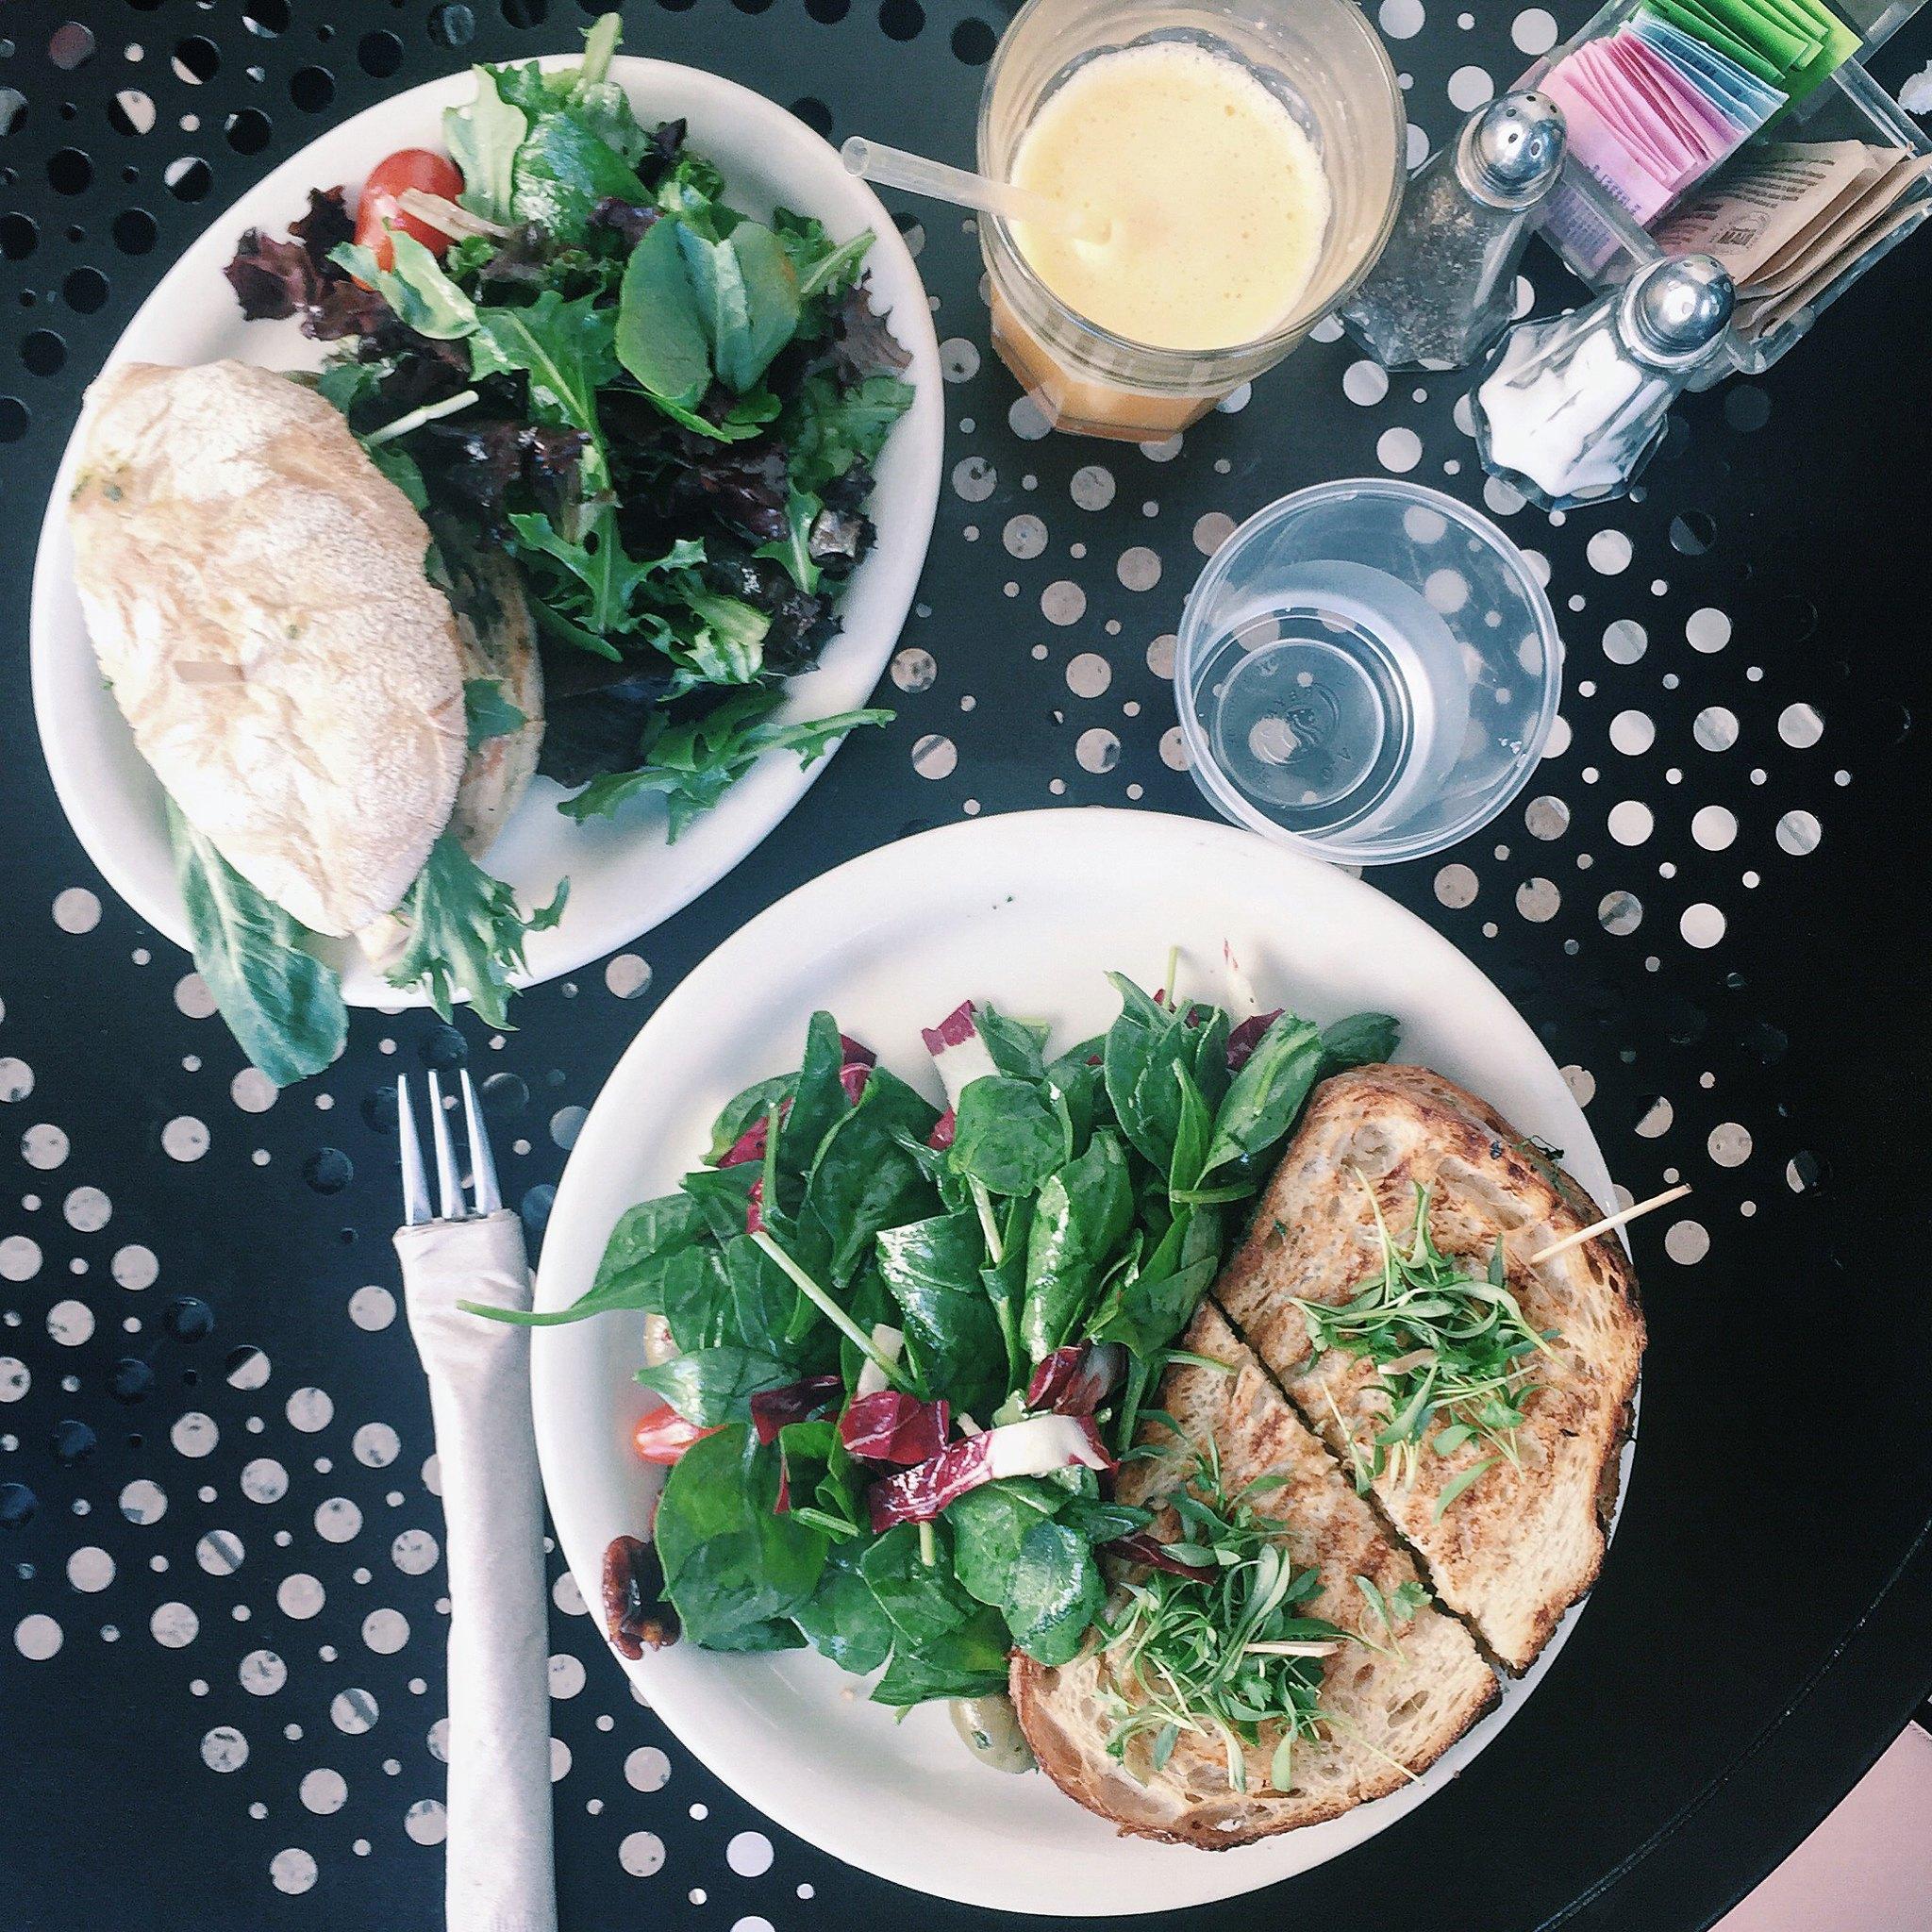 9665-urth-caffe-urban-organic-healthy-foodie-pasadena